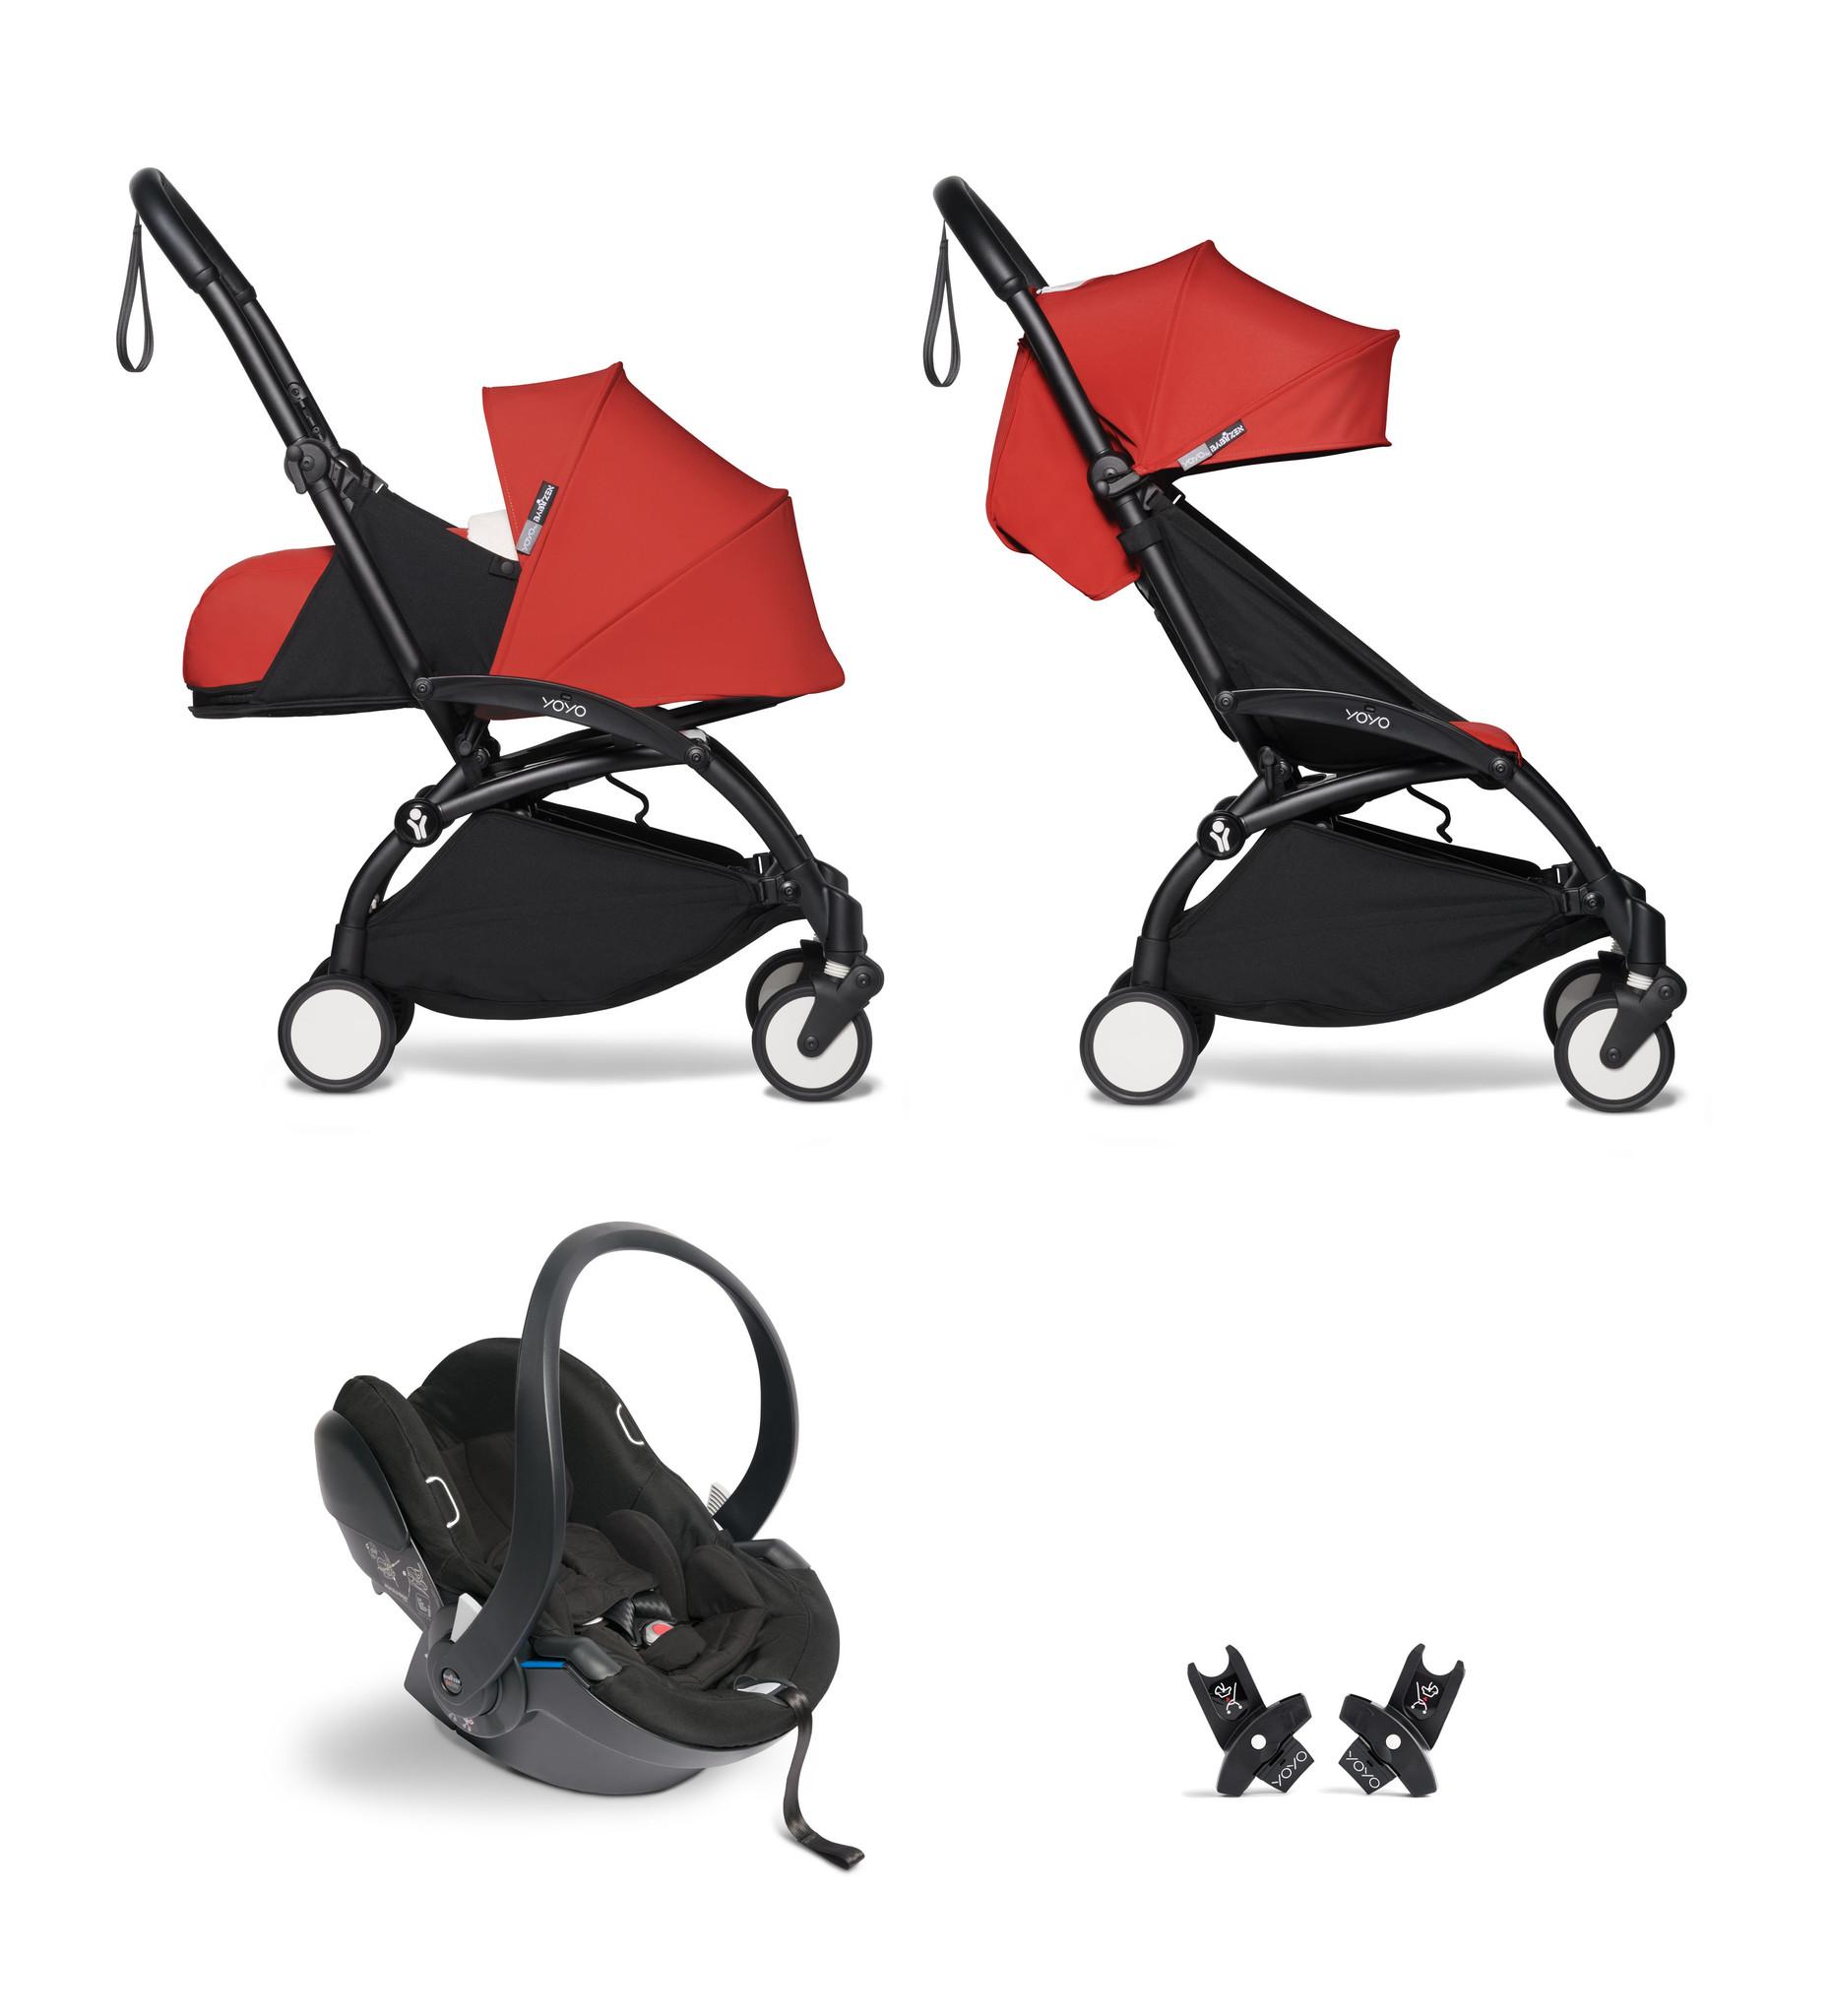 Babyzen YOYO² buggy COMPLEET / FULL SET 0+ and 6+ rood frame zwart incl. YOYO² BeSafe autostoel zwar